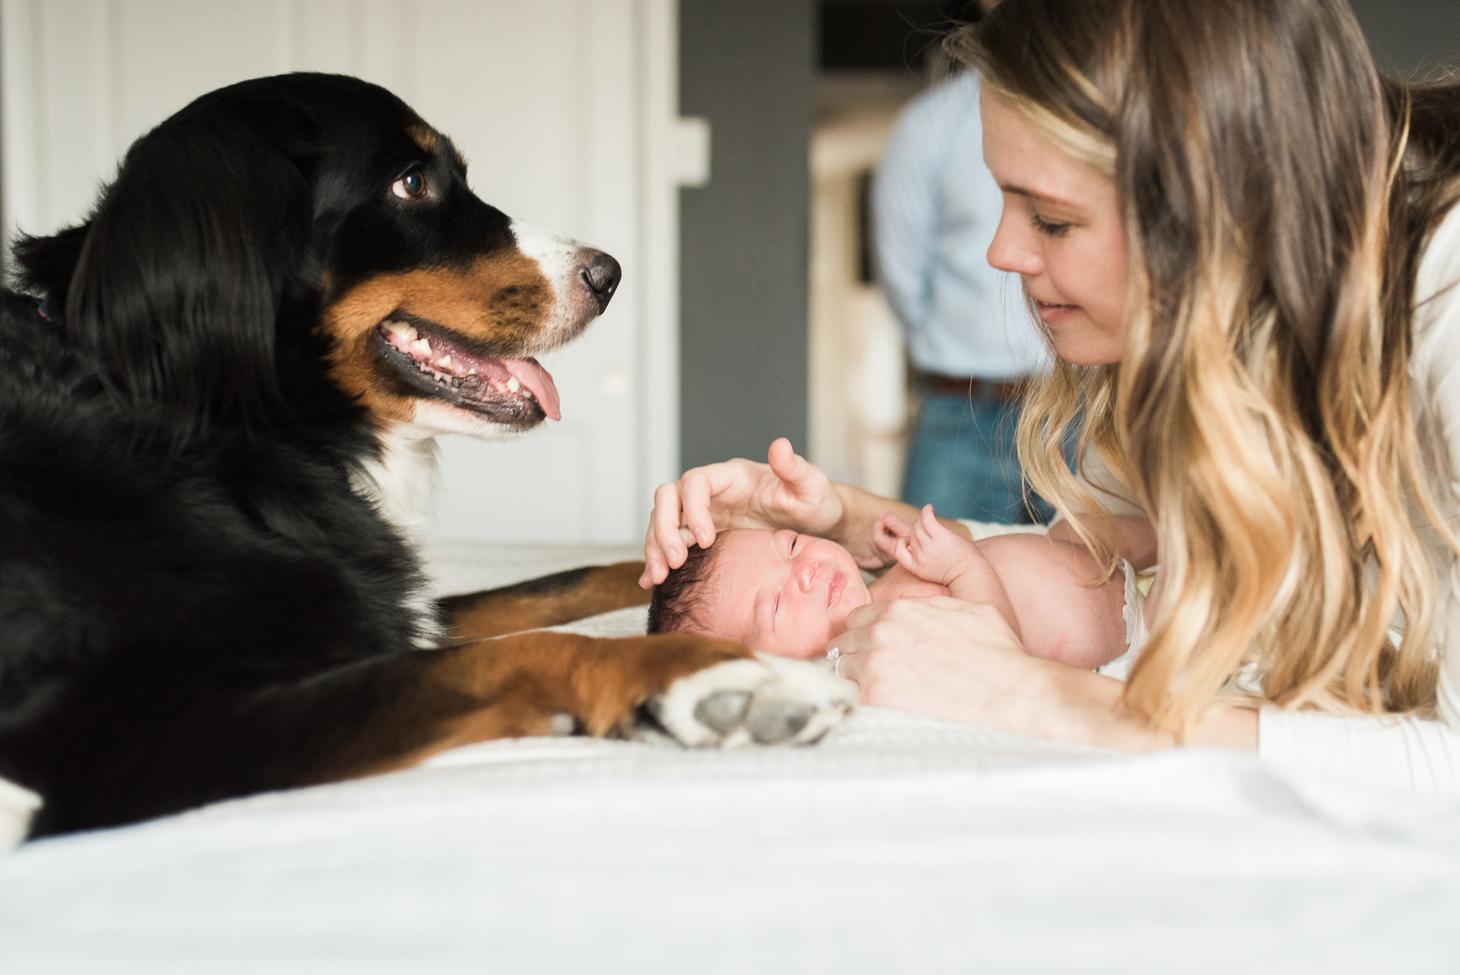 Baltimore-Maryland-Newborn-lifestyle-photographer-breanna kuhlmann-26.jpg